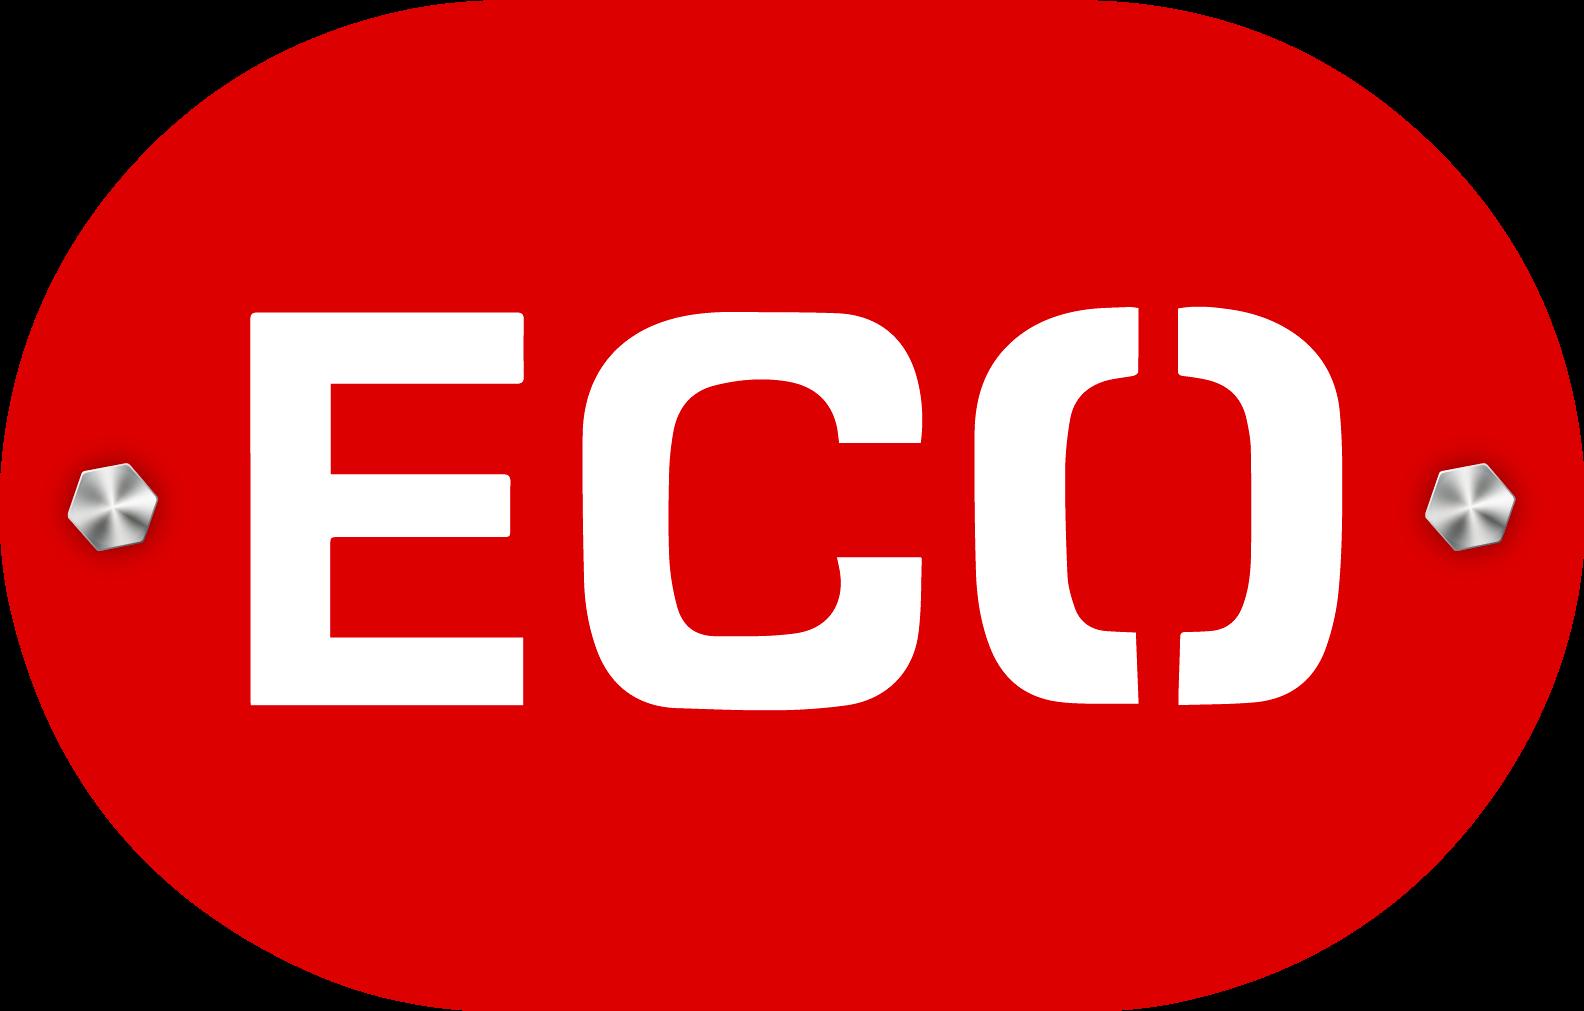 ECO Concepts